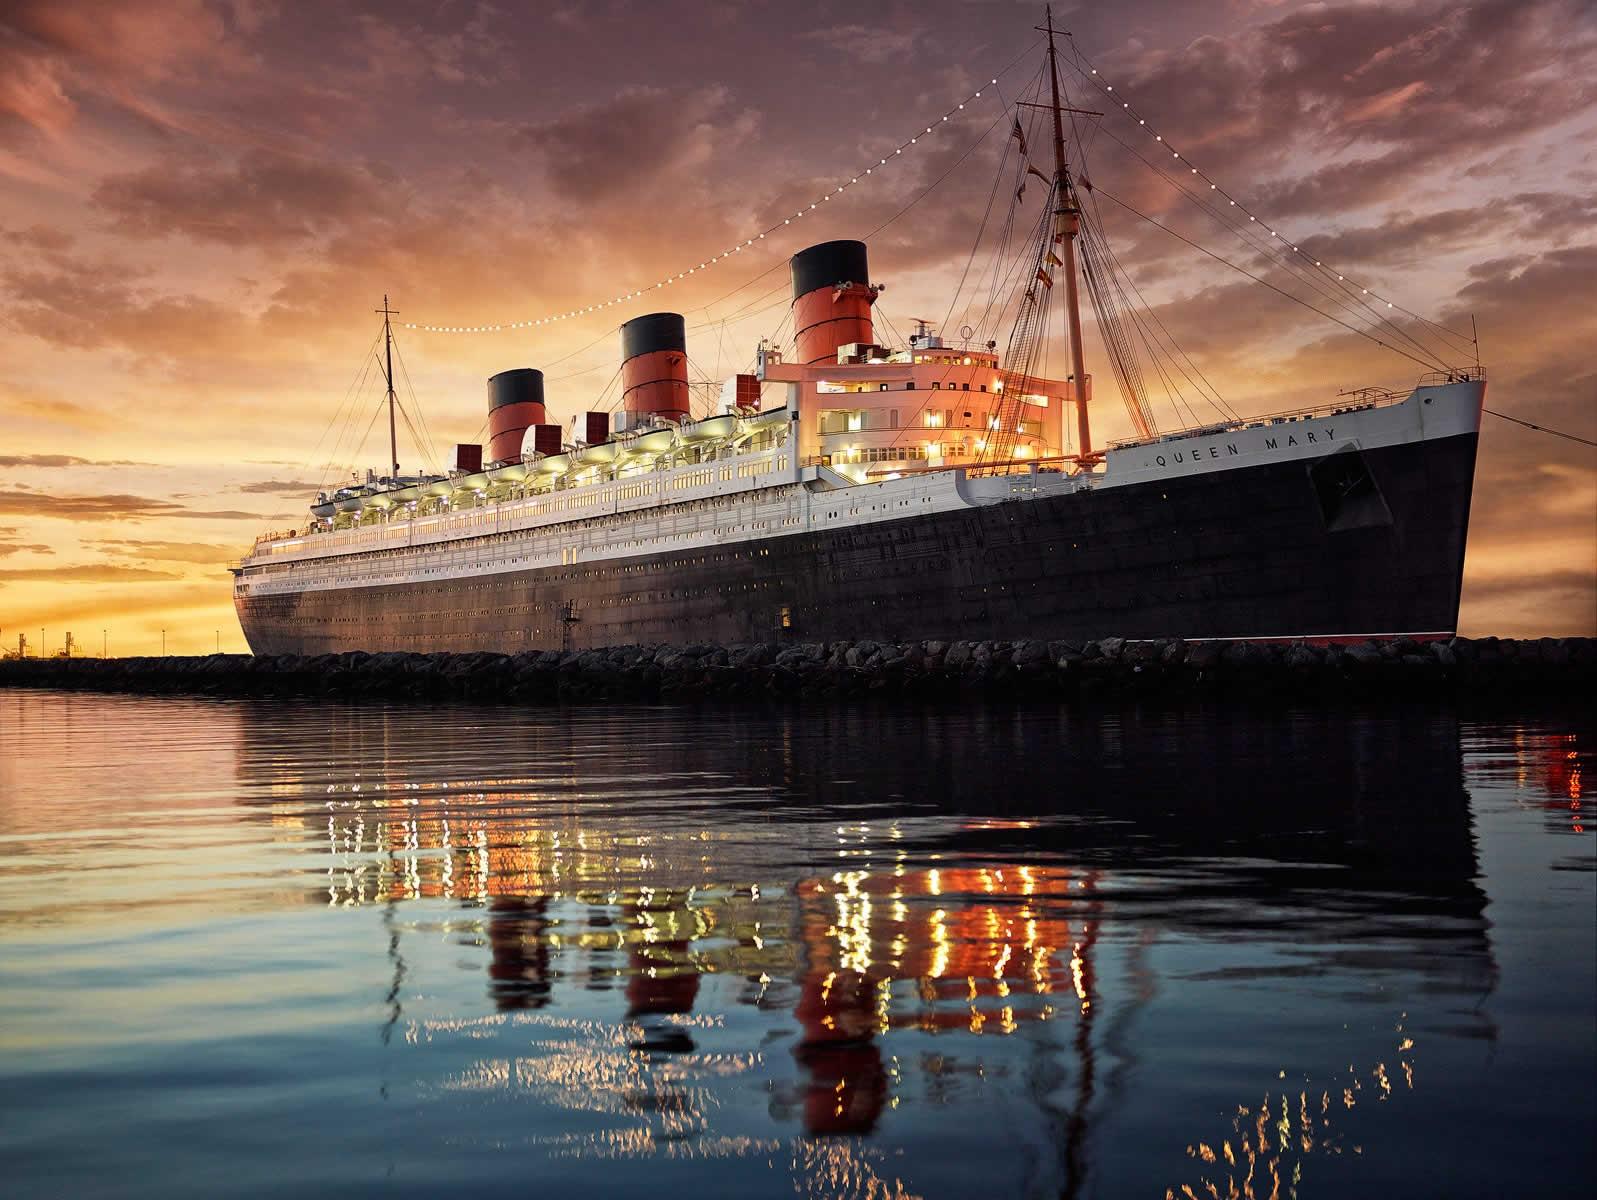 Dormir à bord du Queen Mary